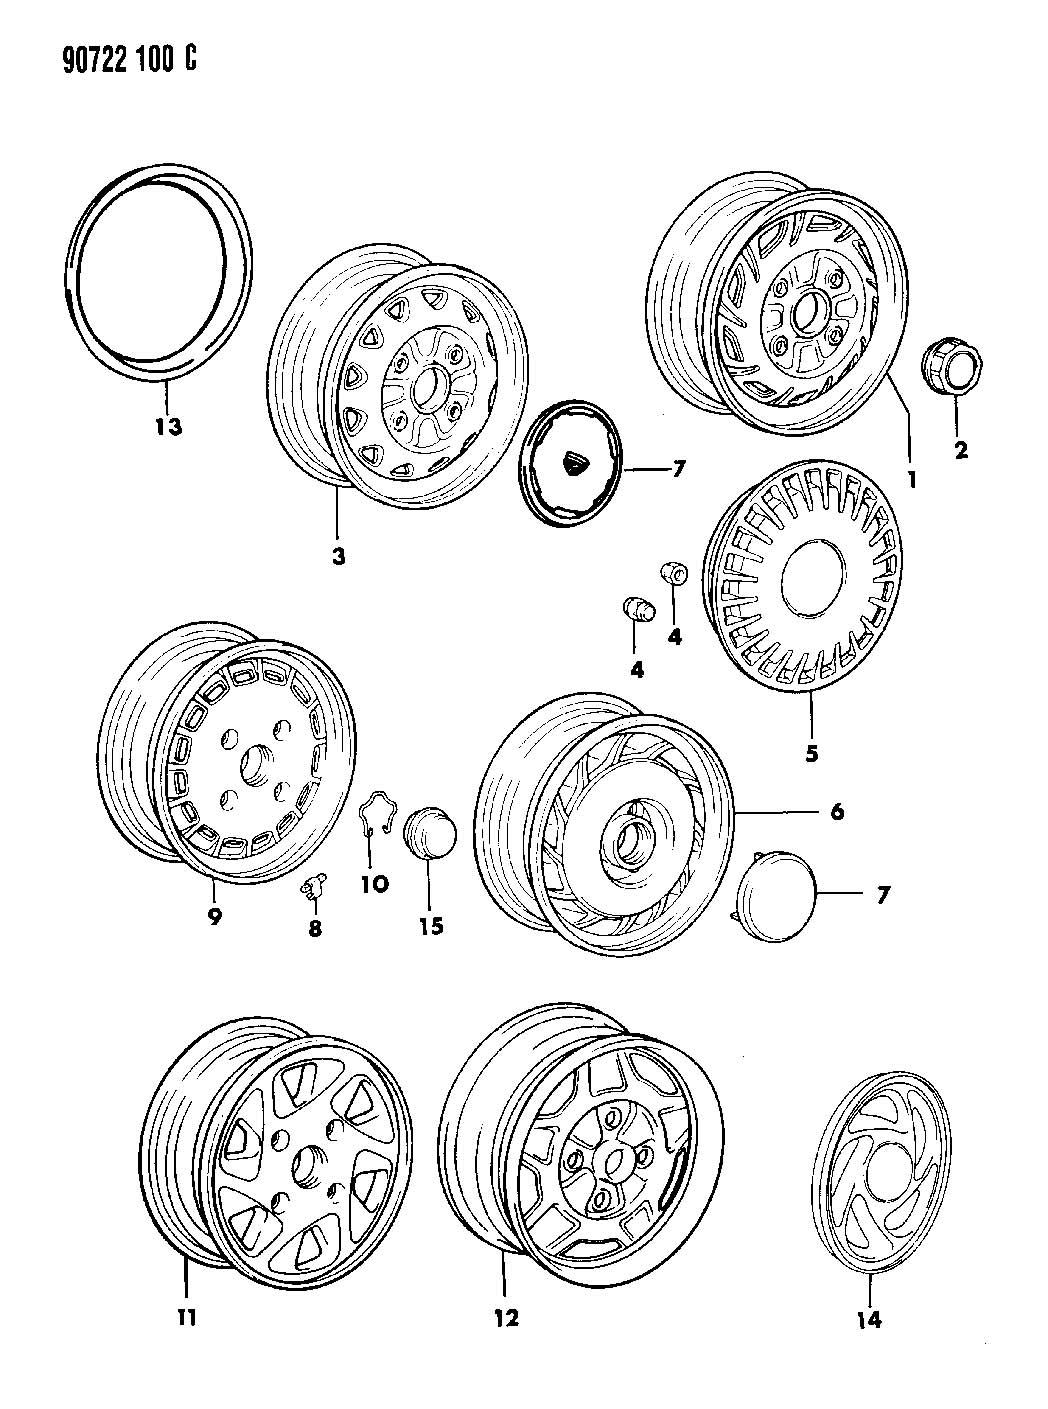 fuse box diagram further 1994 geo prizm parts 1994 geo